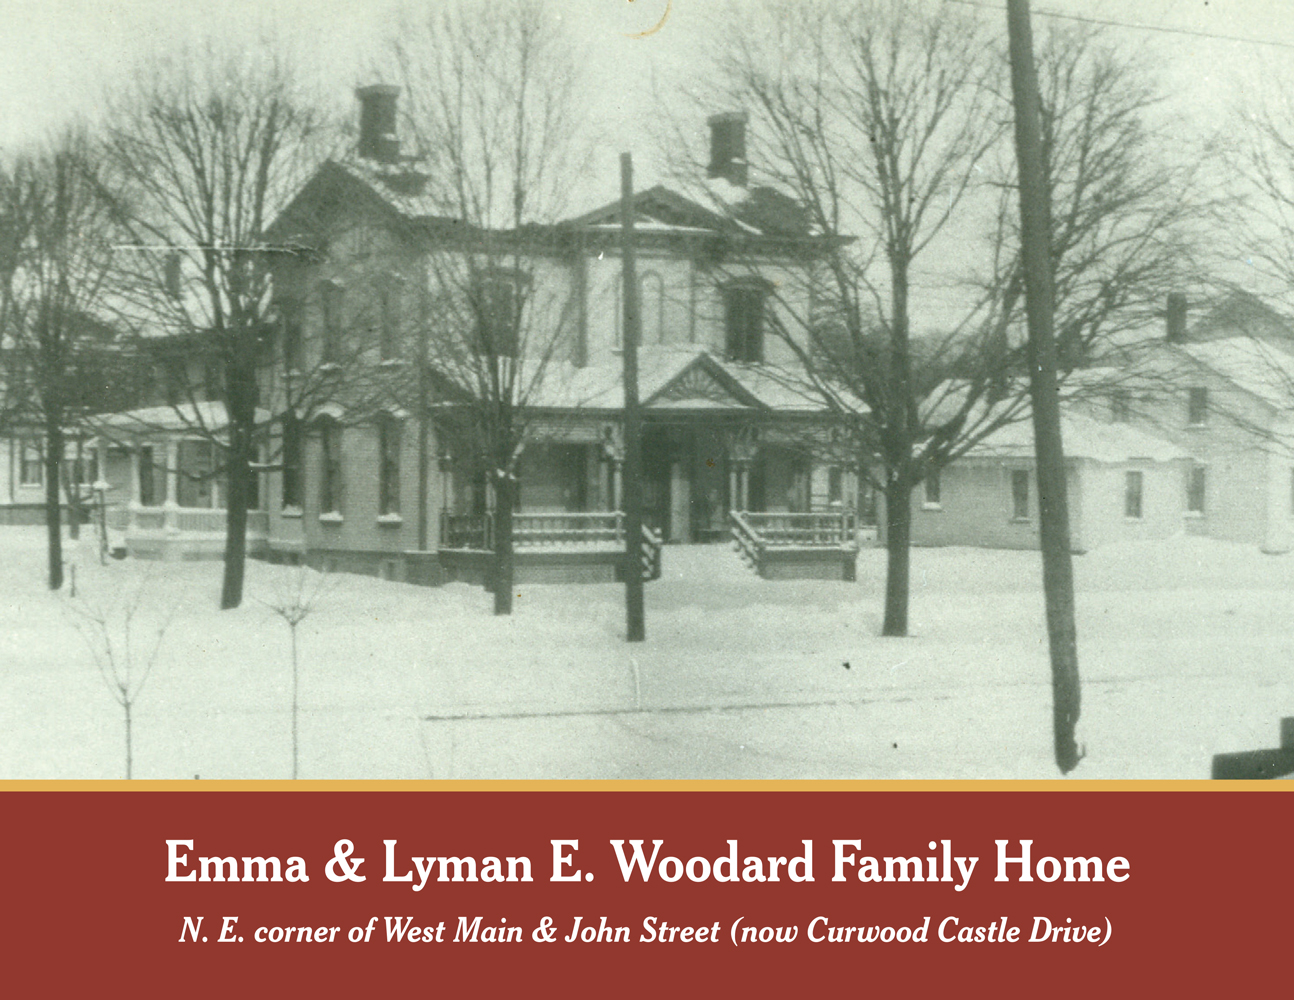 Lyman & Emma E. Woodard Family Home: N.E. corner of West Main and John Street (now Curwood Castle Drive)